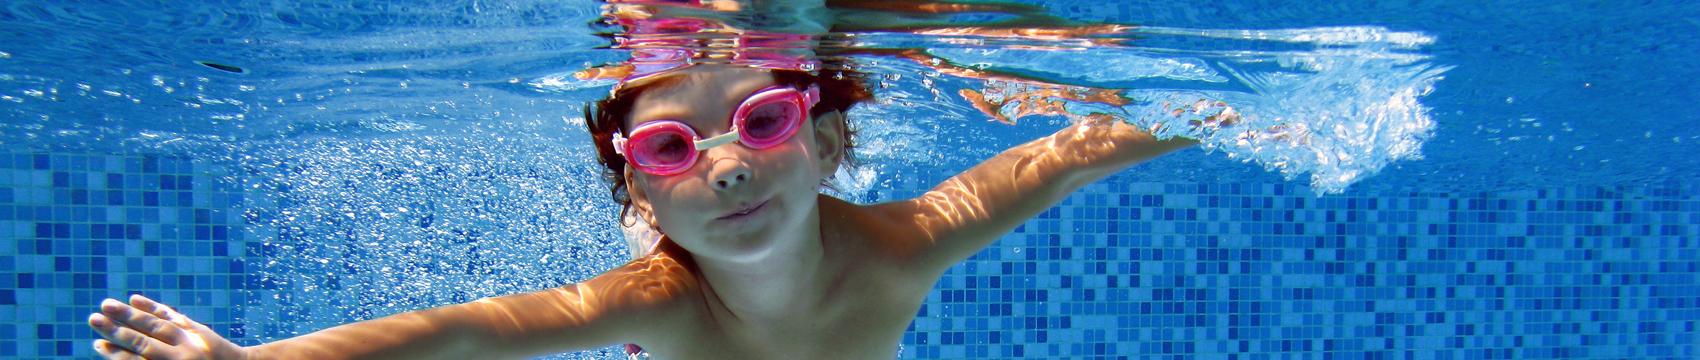 actividades de verano para un niño